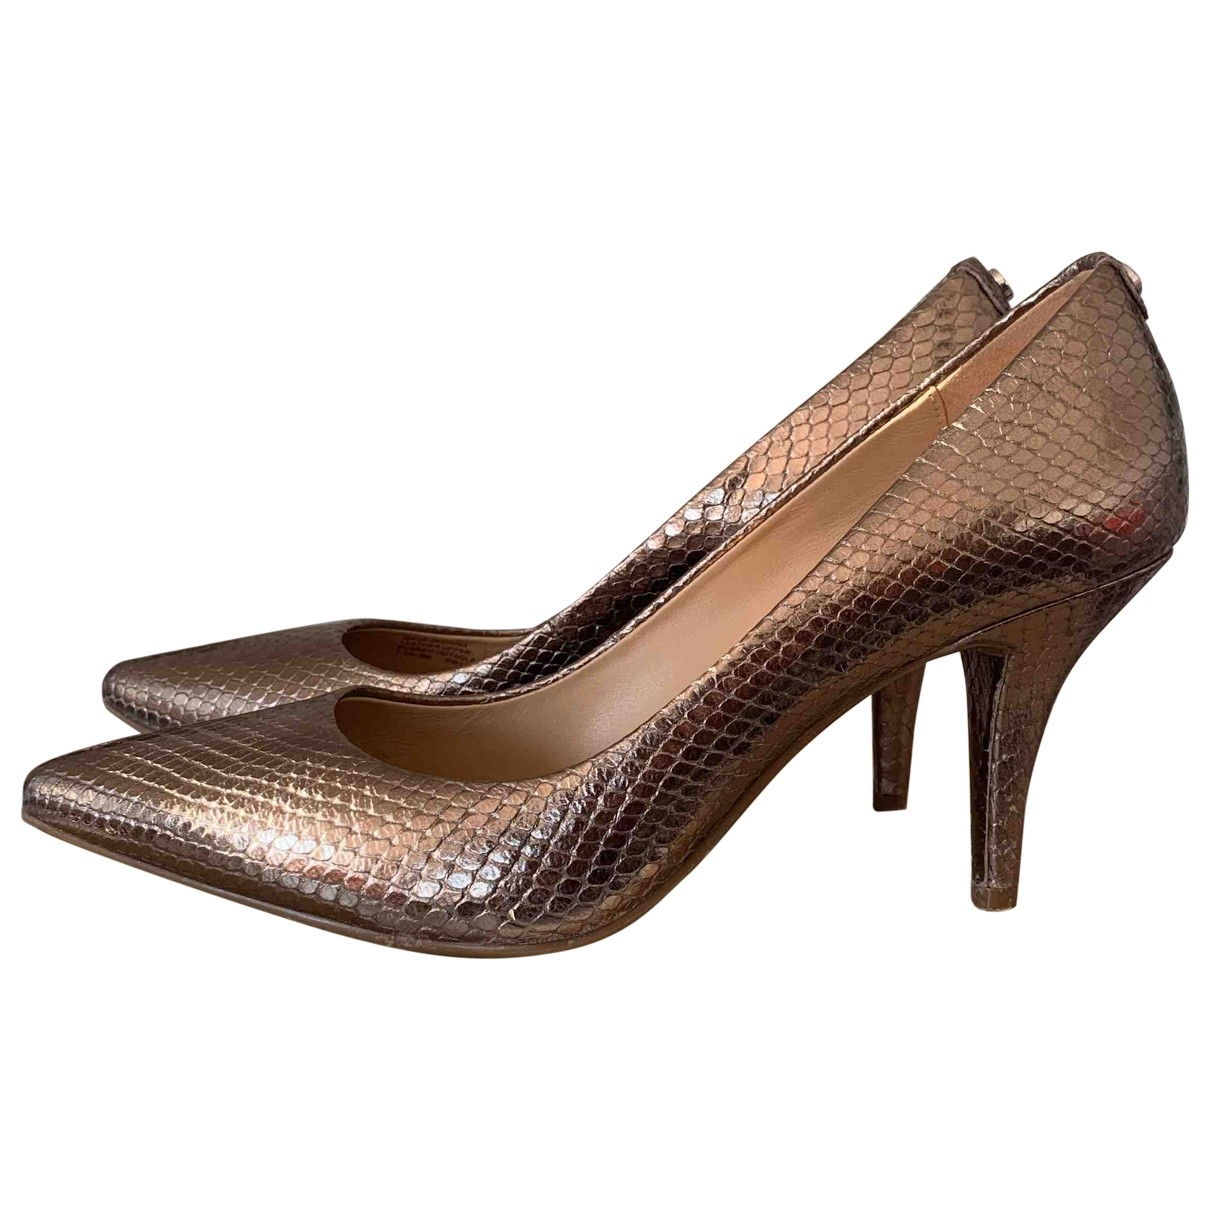 Michael Kors \N Metallic Leather Heels for Women 38 EU